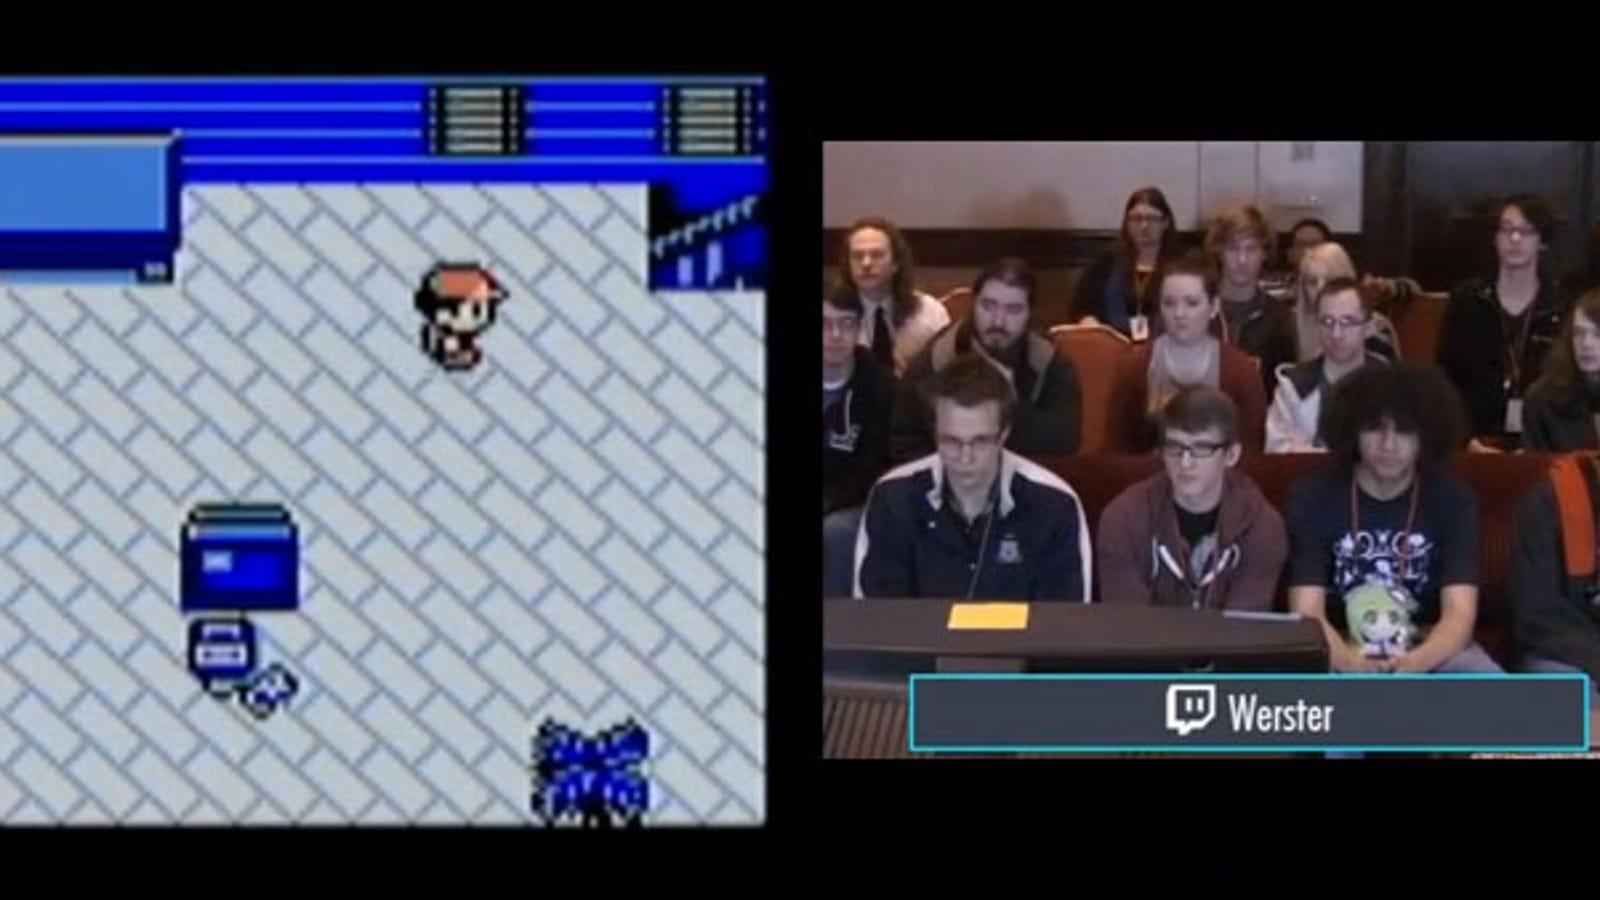 Terminan Pokémon Red/Blue en 21 minutos y sin combatir jefes